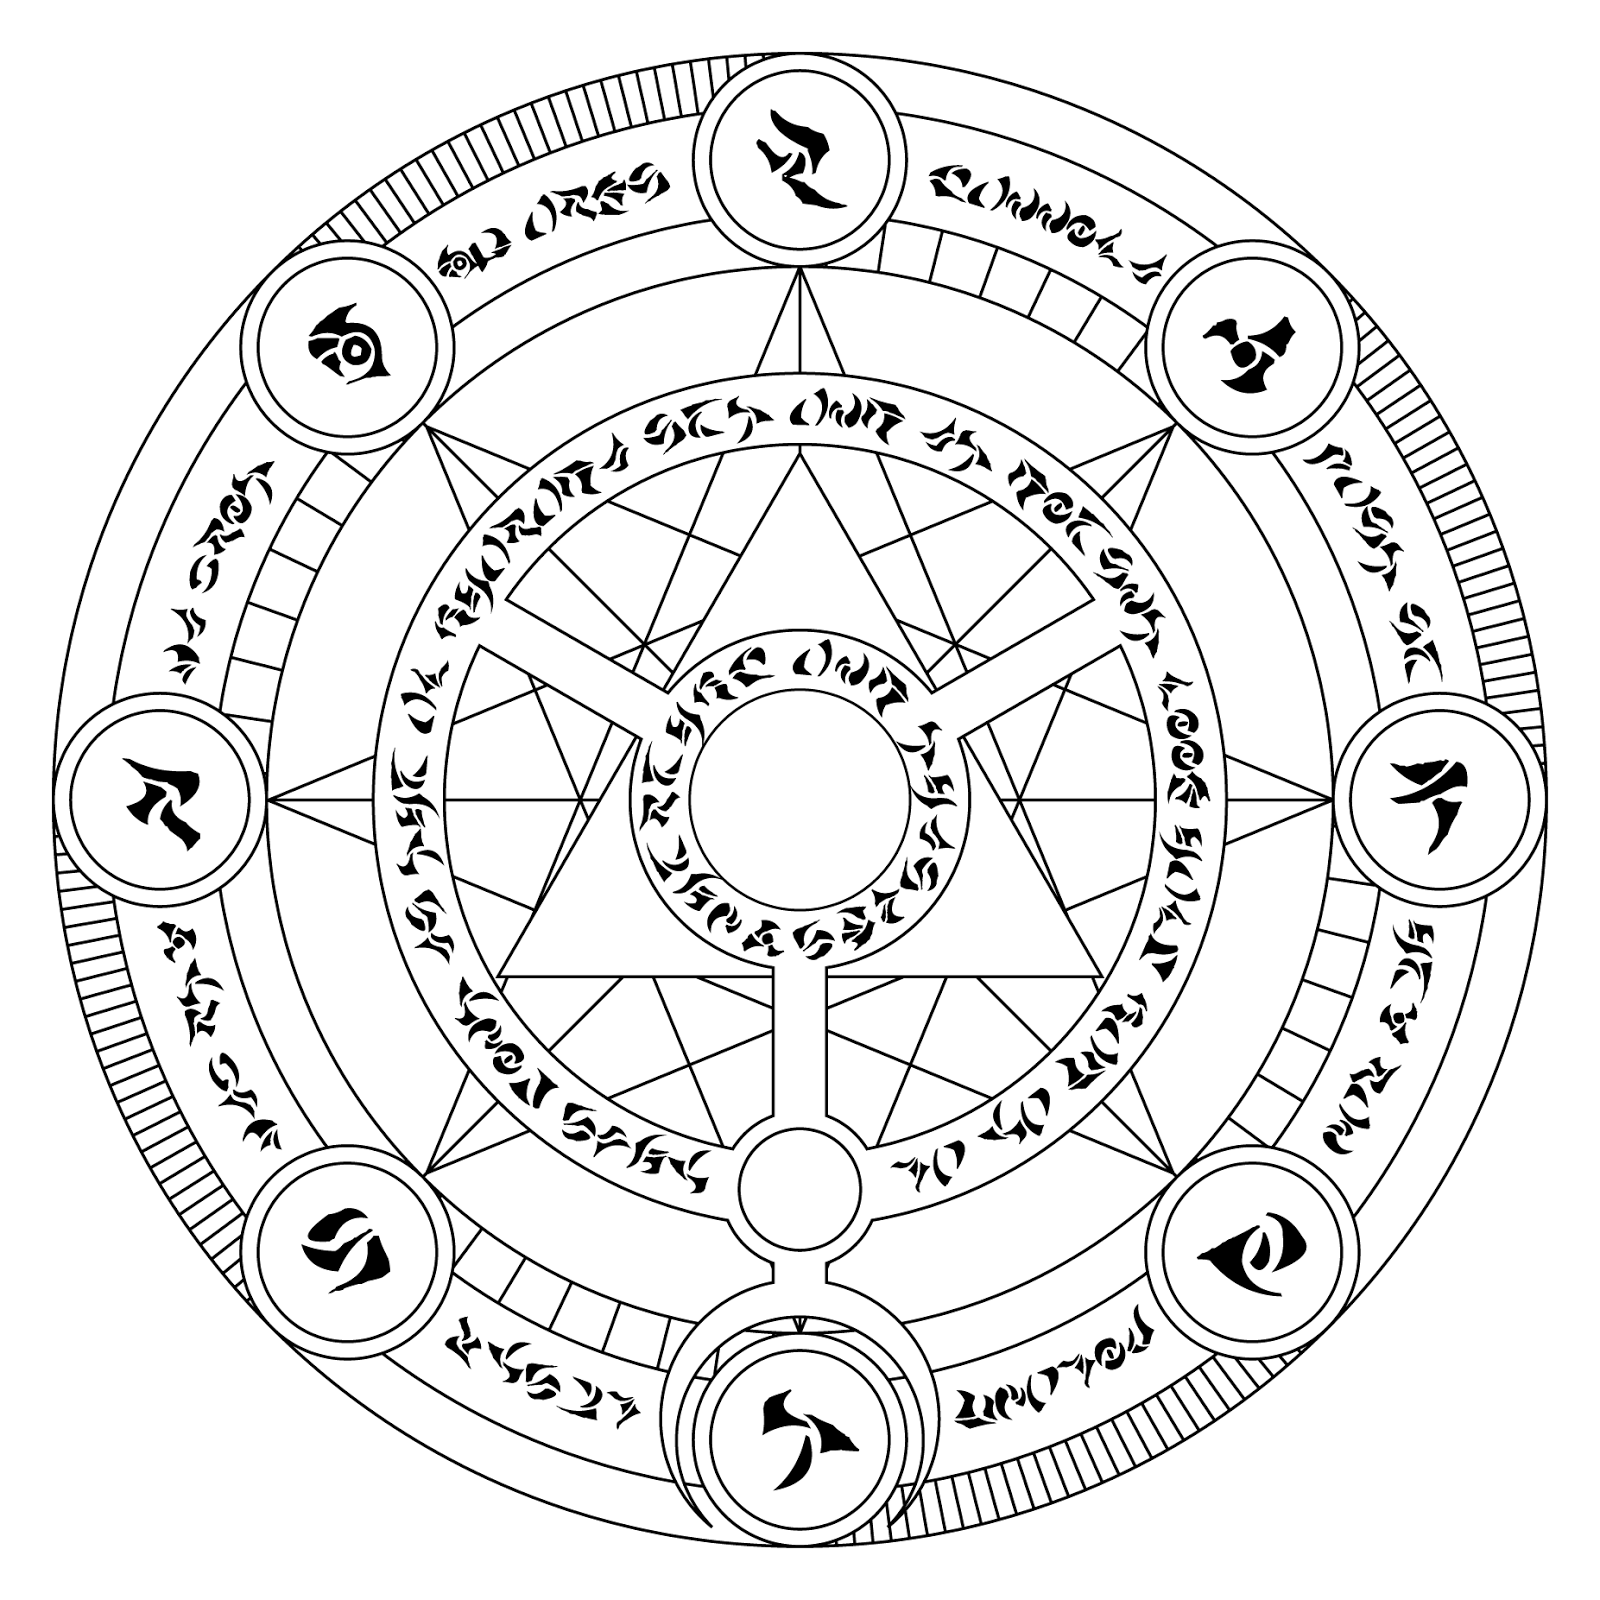 propnomicon magic circle black magic magic circle